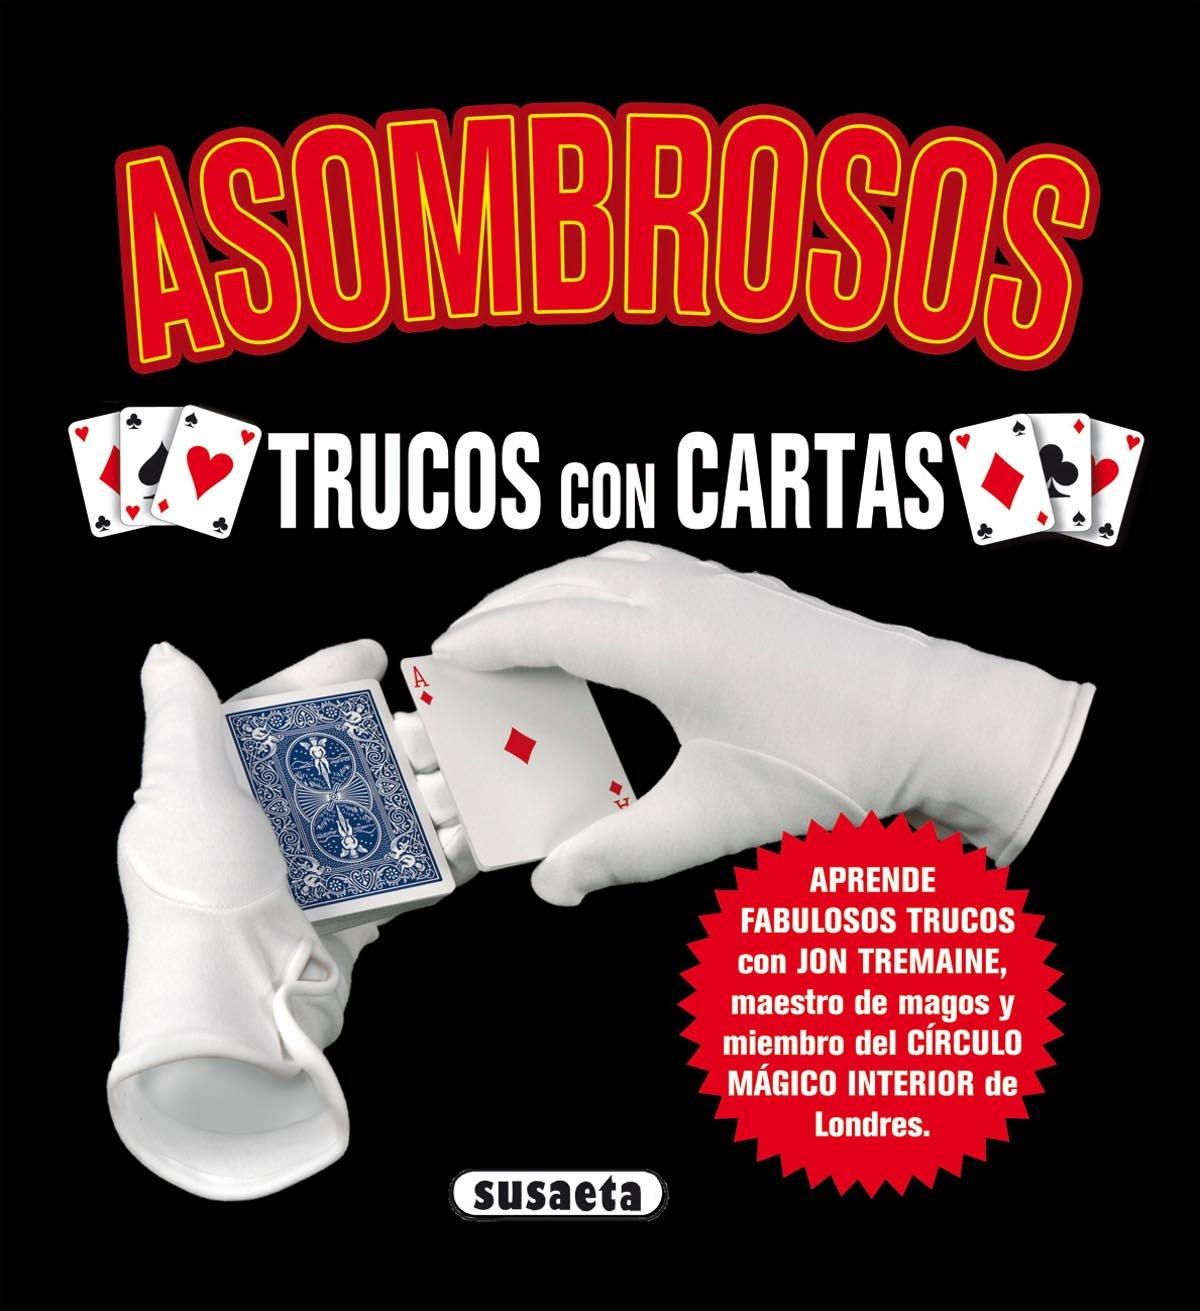 Asombrosos Trucos Con Cartas (Magia Para Todos): Amazon.es ...